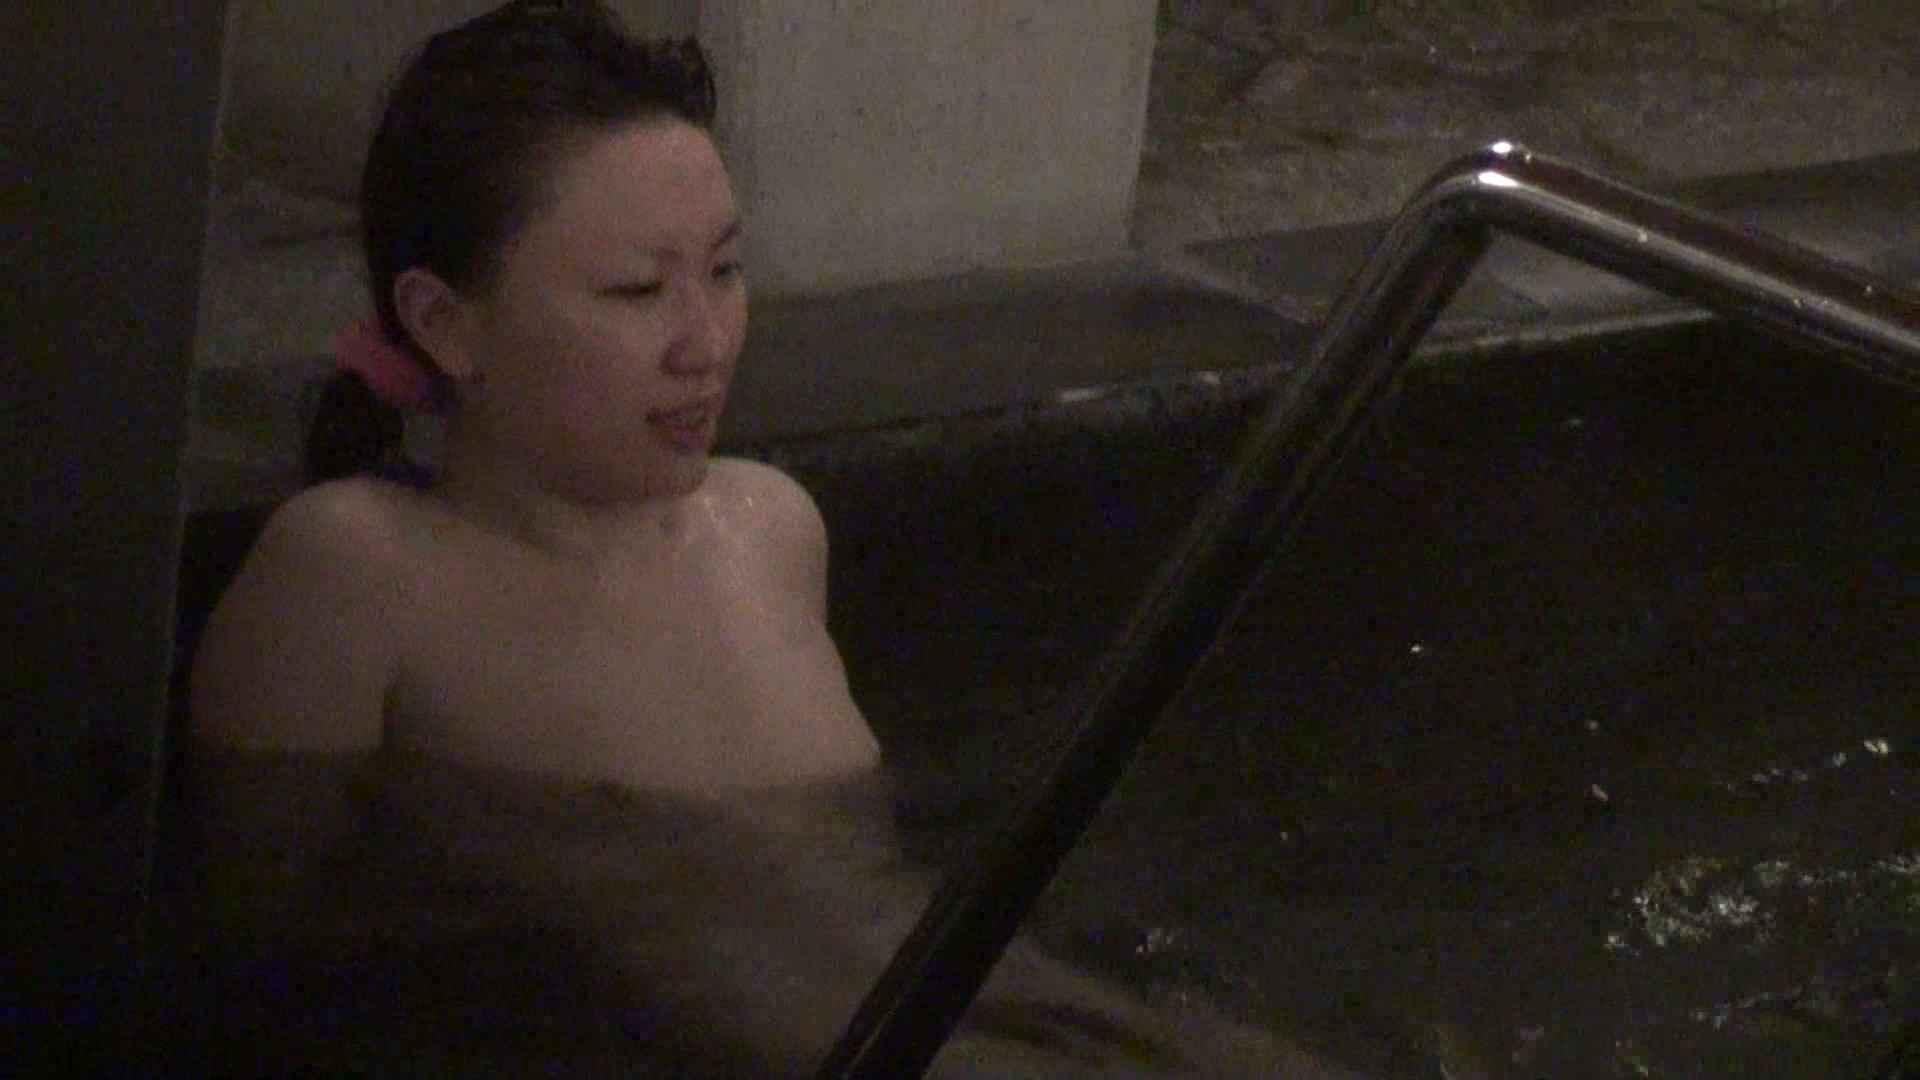 Aquaな露天風呂Vol.394 盗撮 | OLセックス  99画像 28